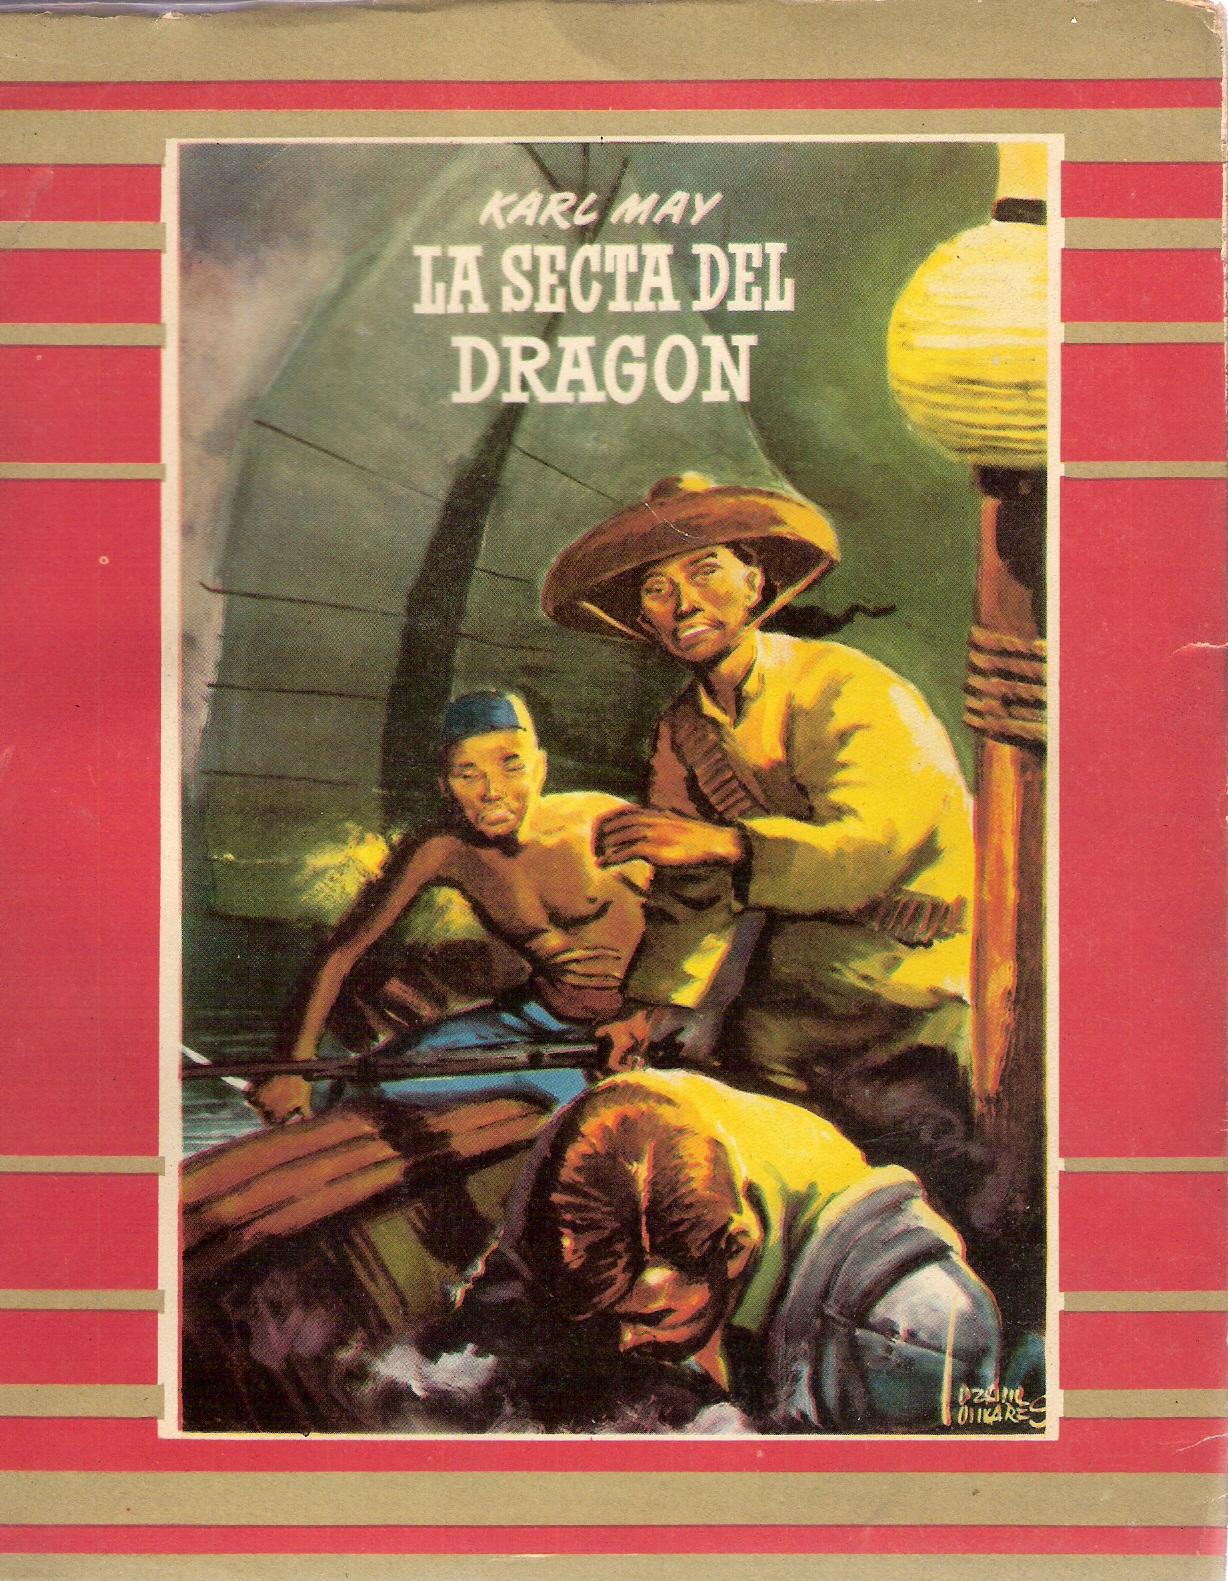 La secta del dragón